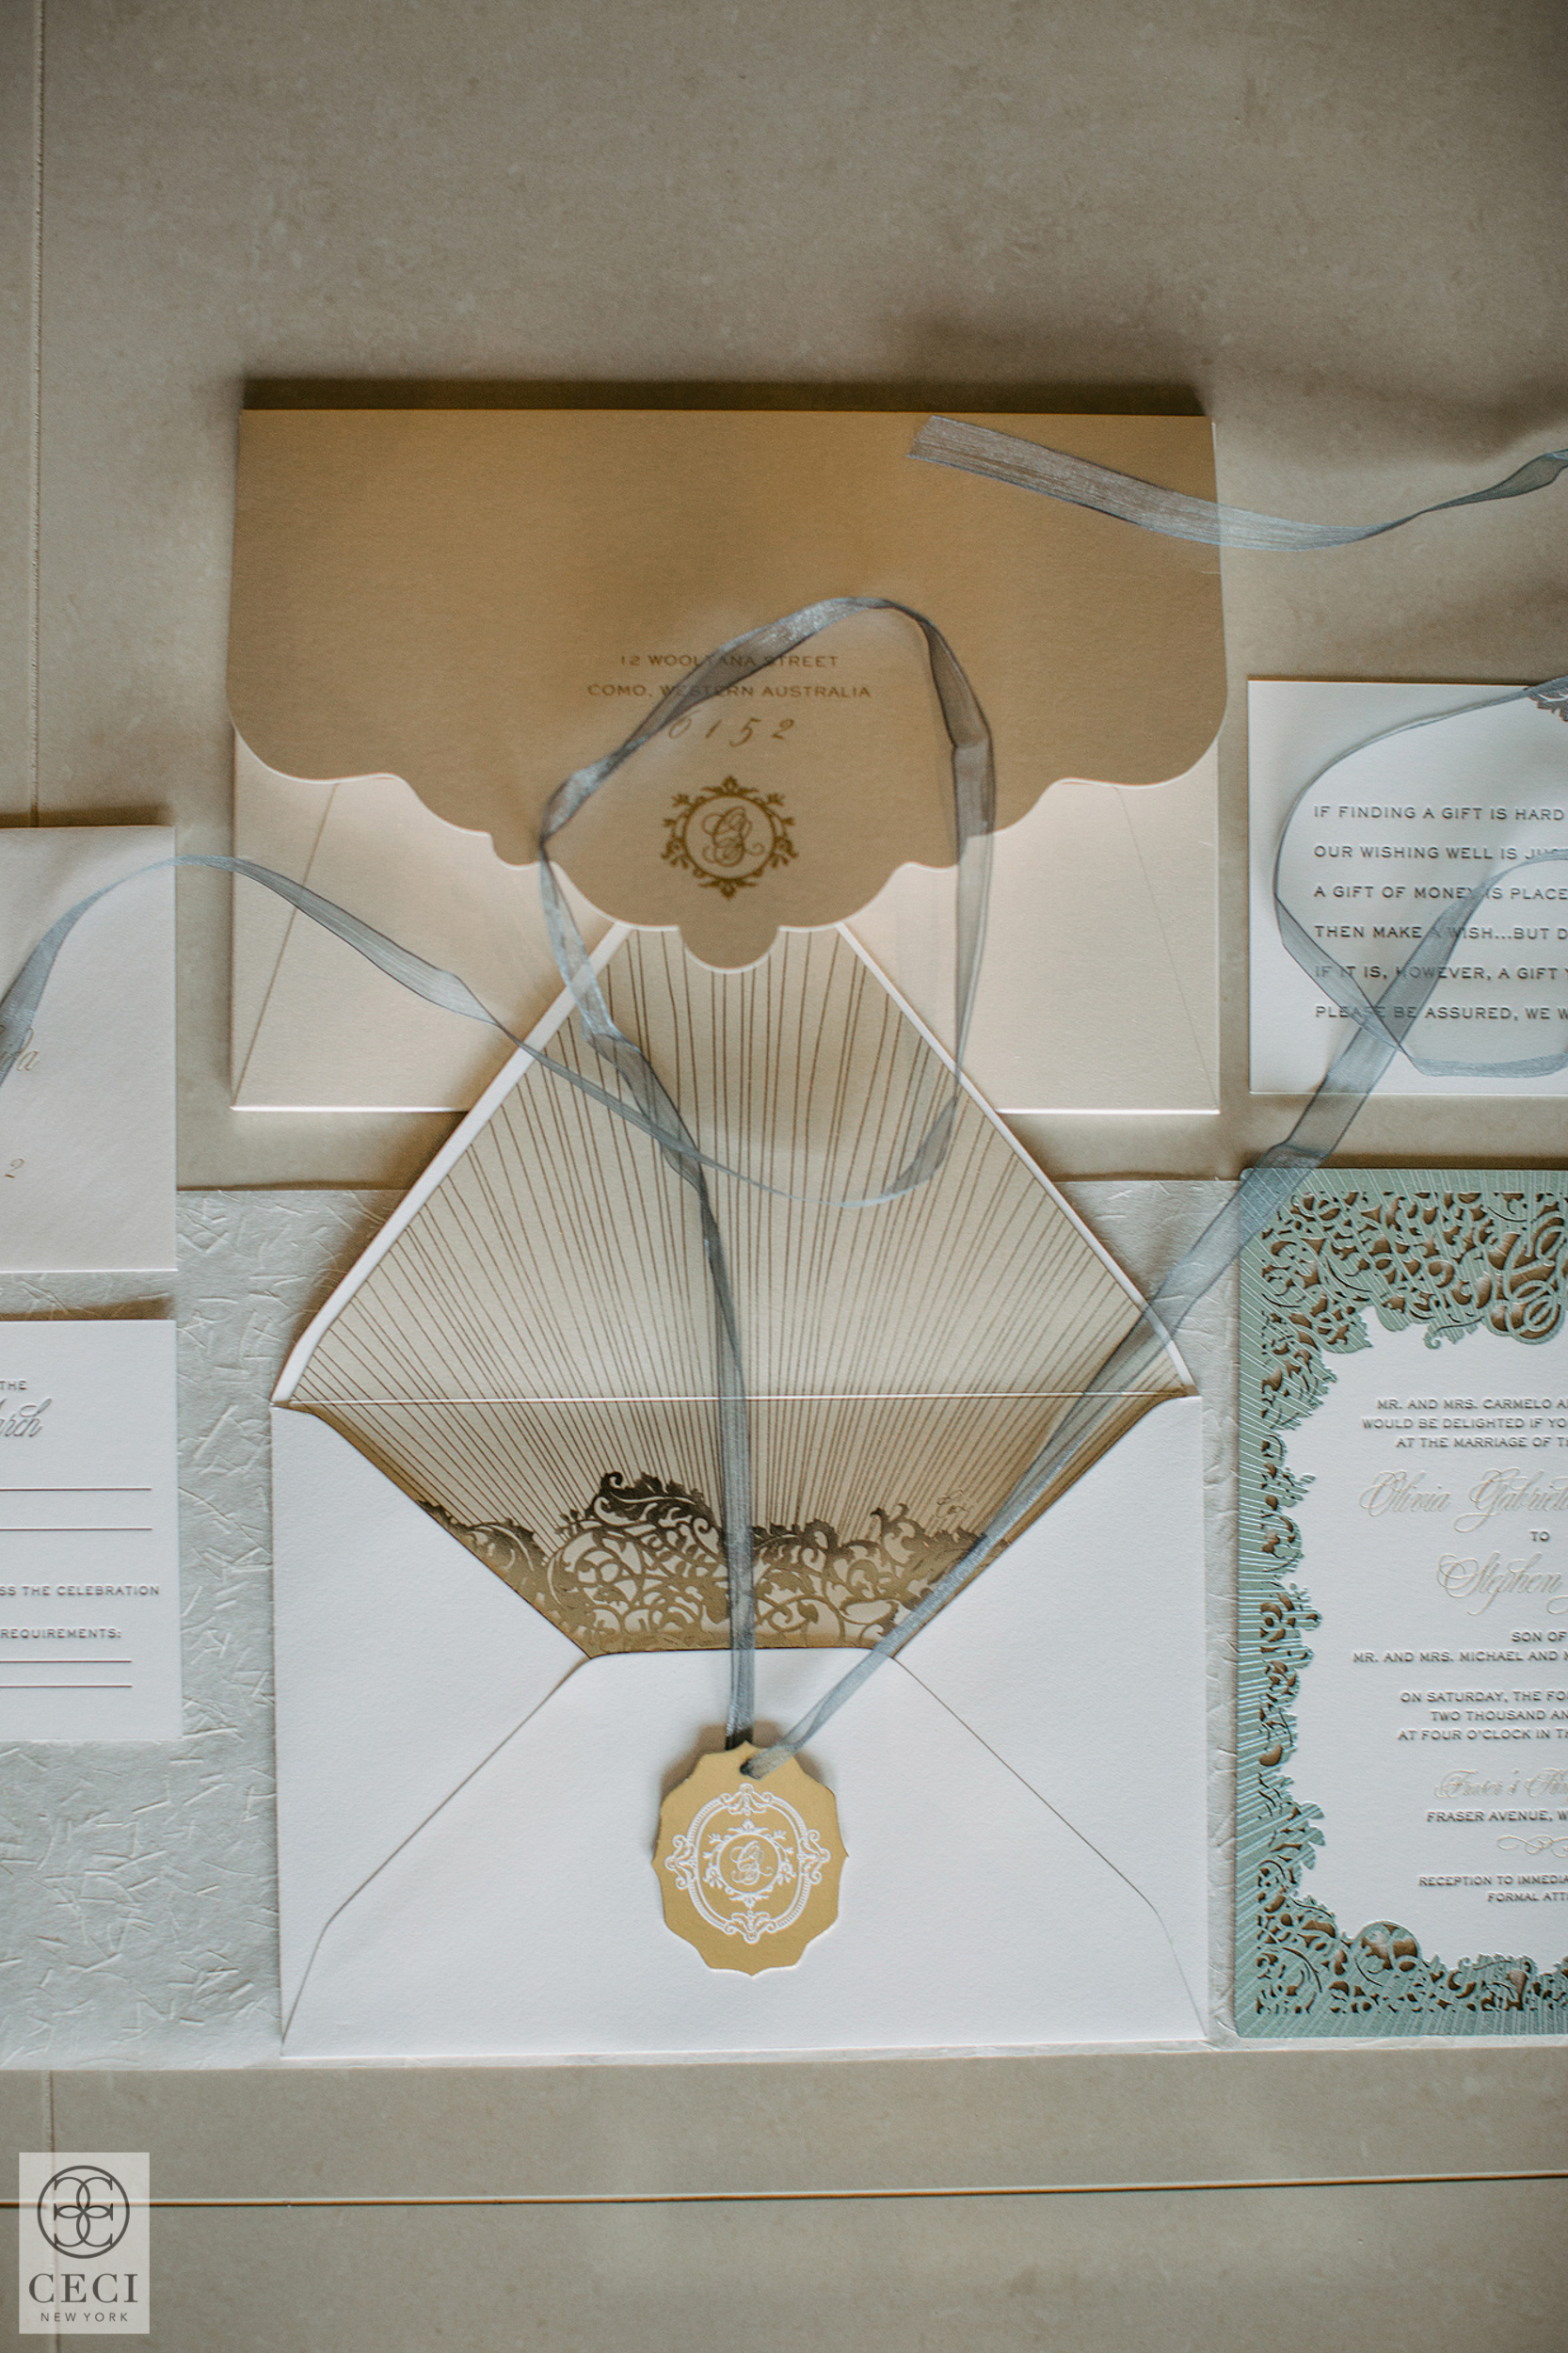 Ceci_New_York_Custom_Luxury_Wedding_BeautyShot_LaserCut_Stationery_Personalized_Couture_Foil_Stamping_Perth_Destination_Australia_Chic_-3.jpg